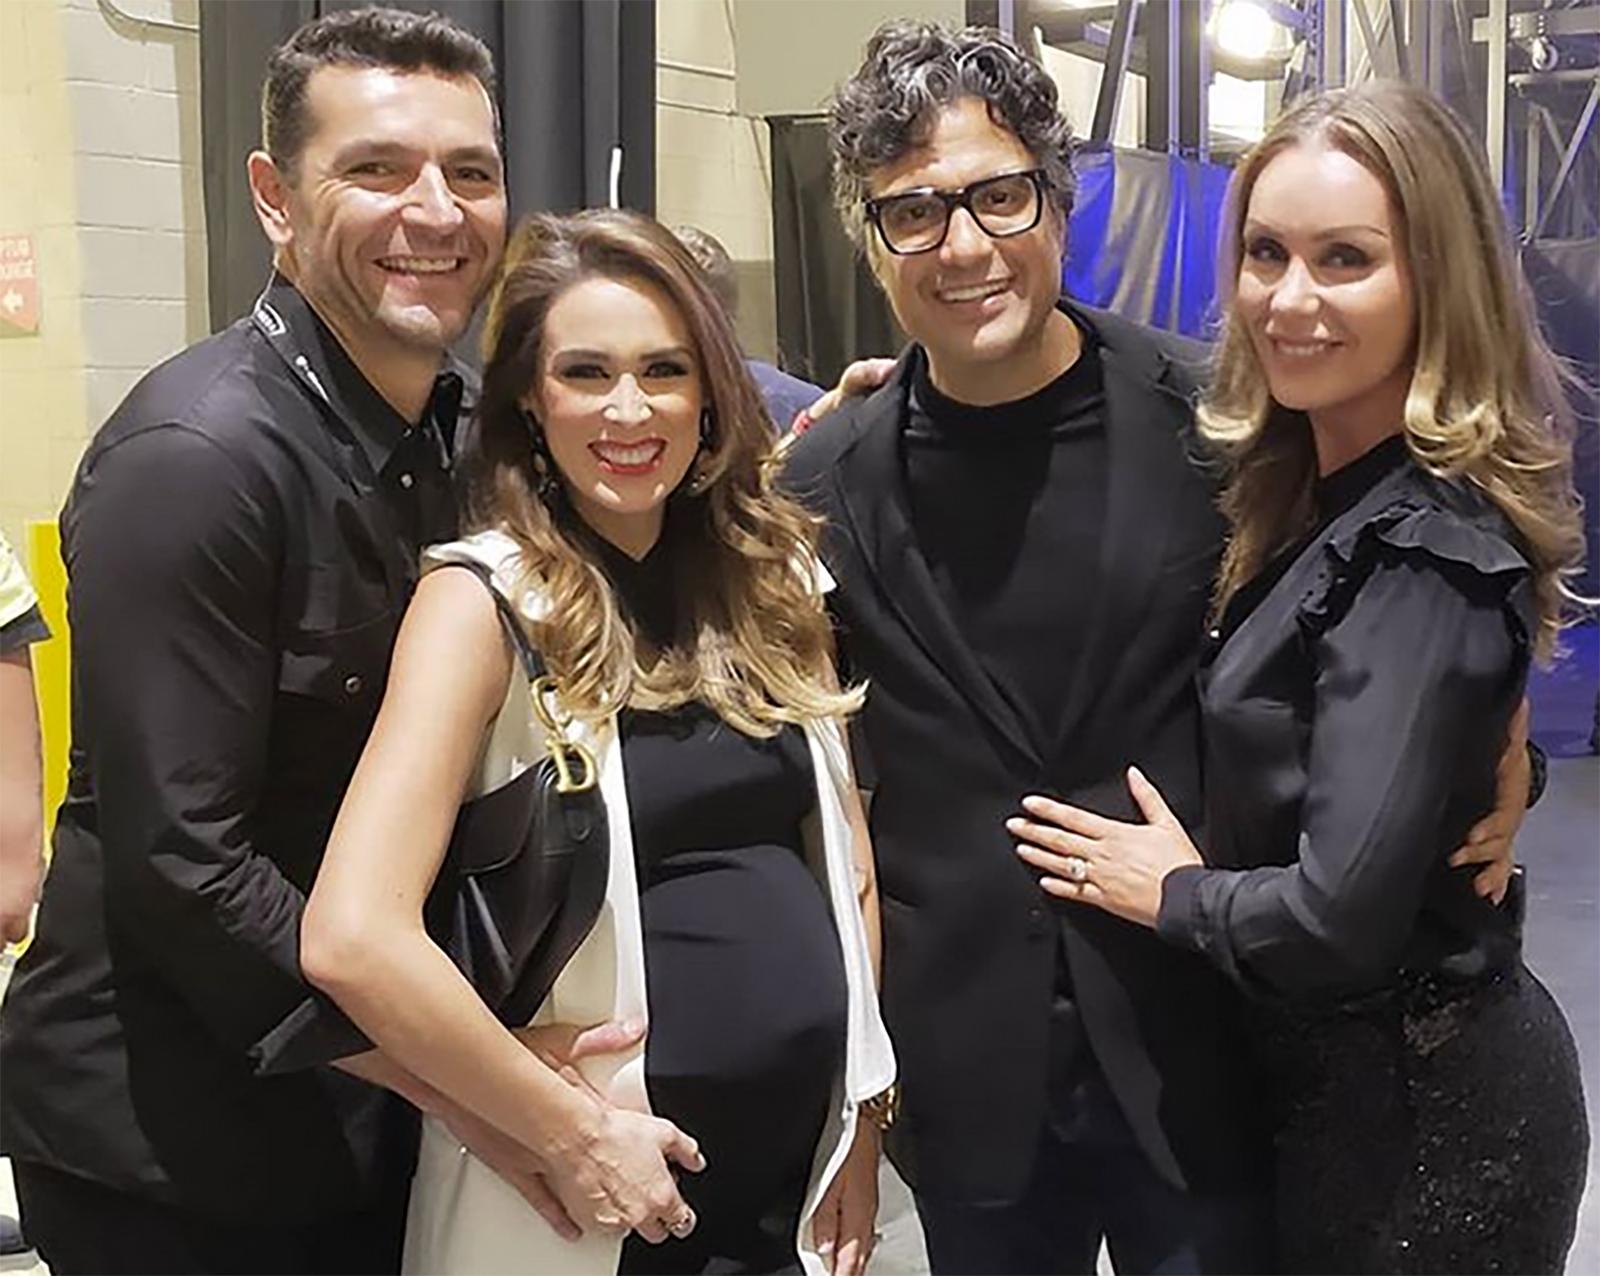 Jacky Bracamontes, Martín Fuentes, Jaime Camil, Heidi Balvanera